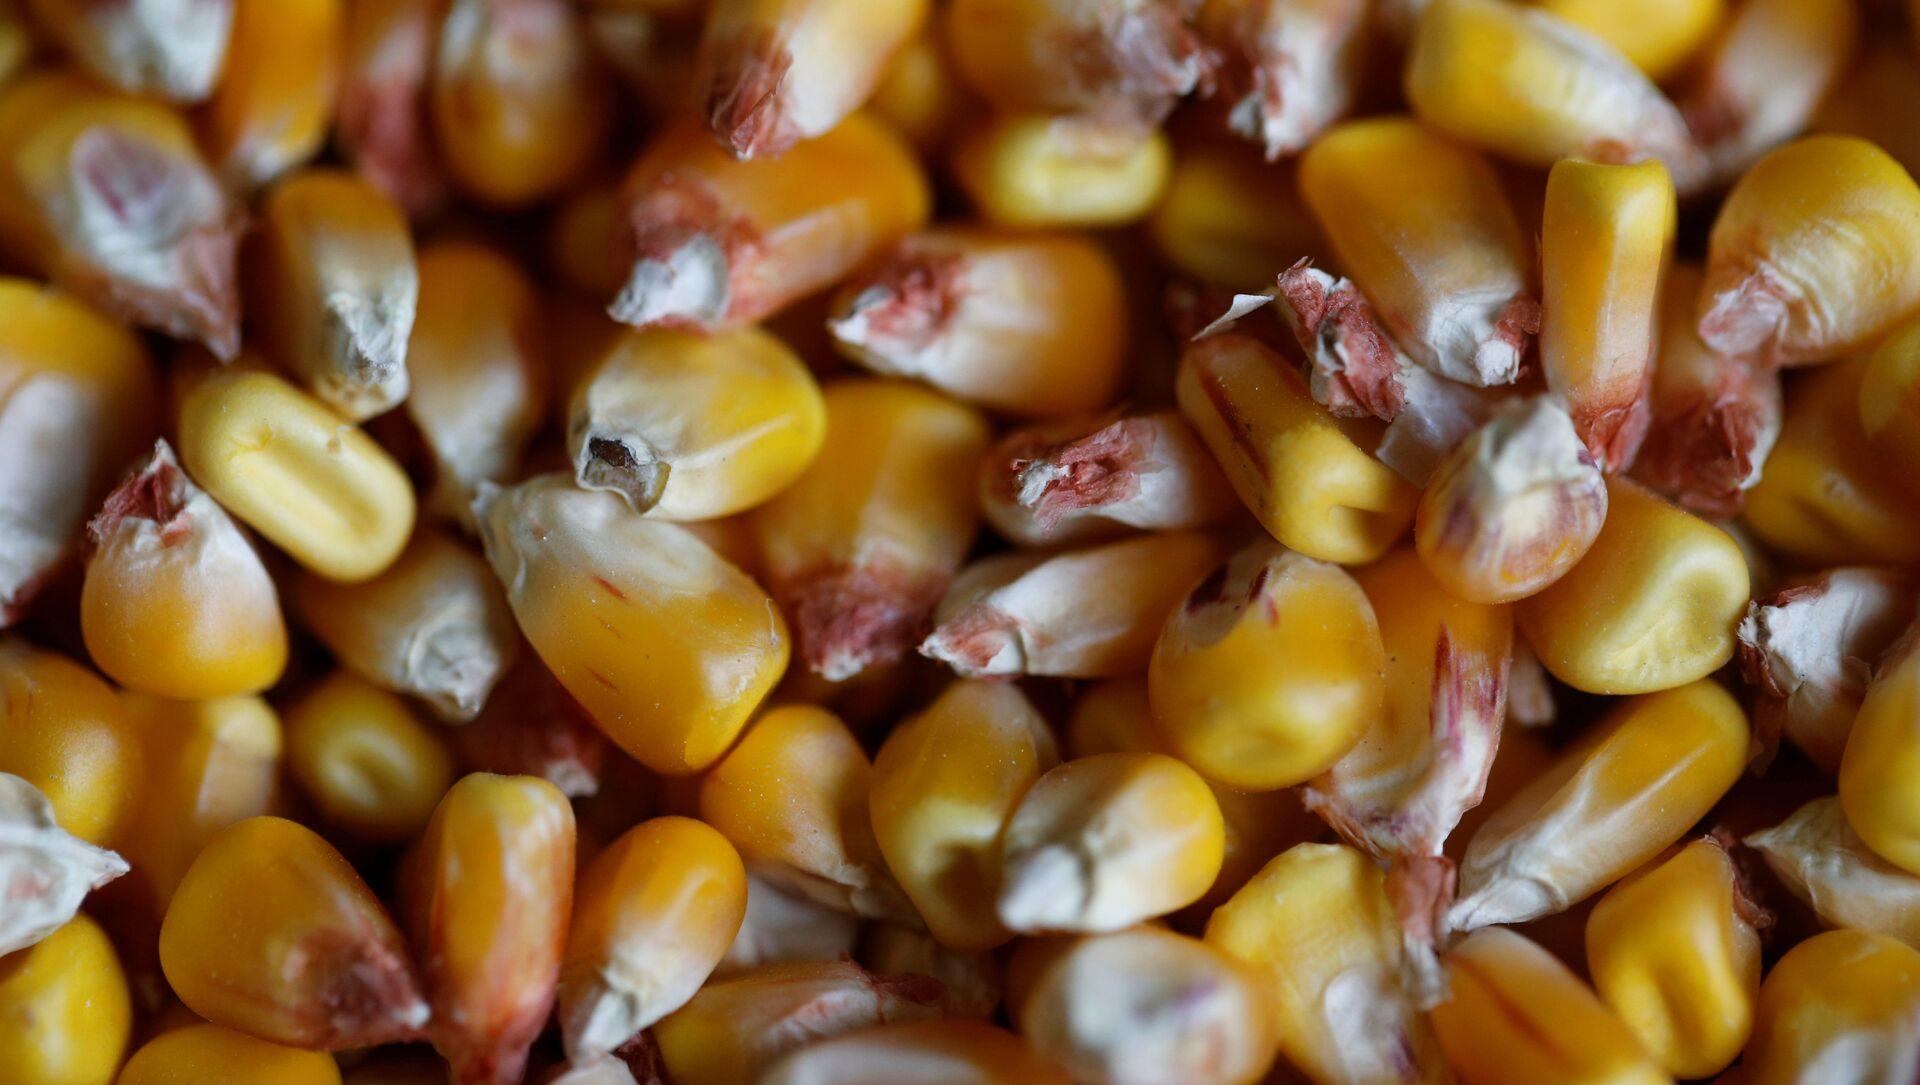 Granos de maíz (imágen referencial) - Sputnik Mundo, 1920, 15.07.2020